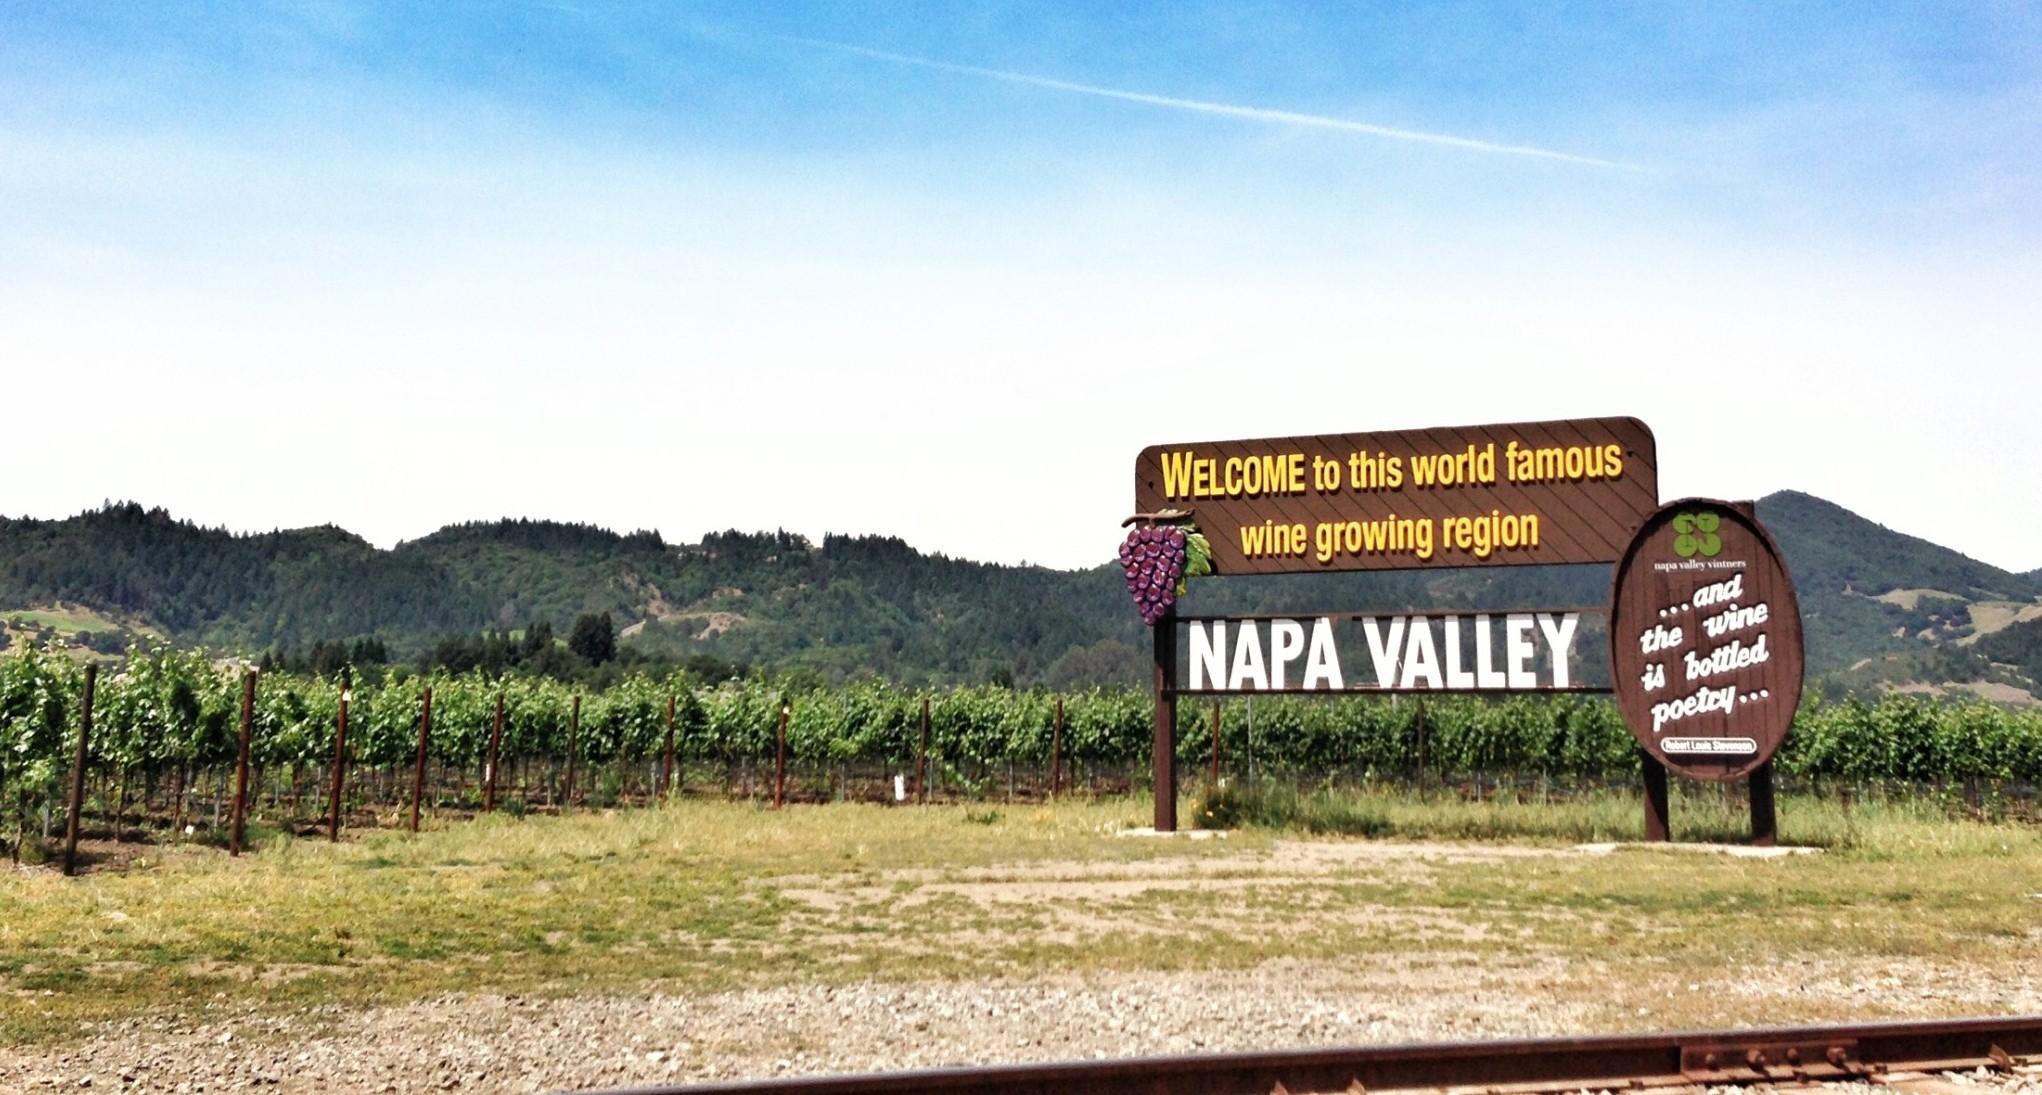 napa valley, the-alyst.com